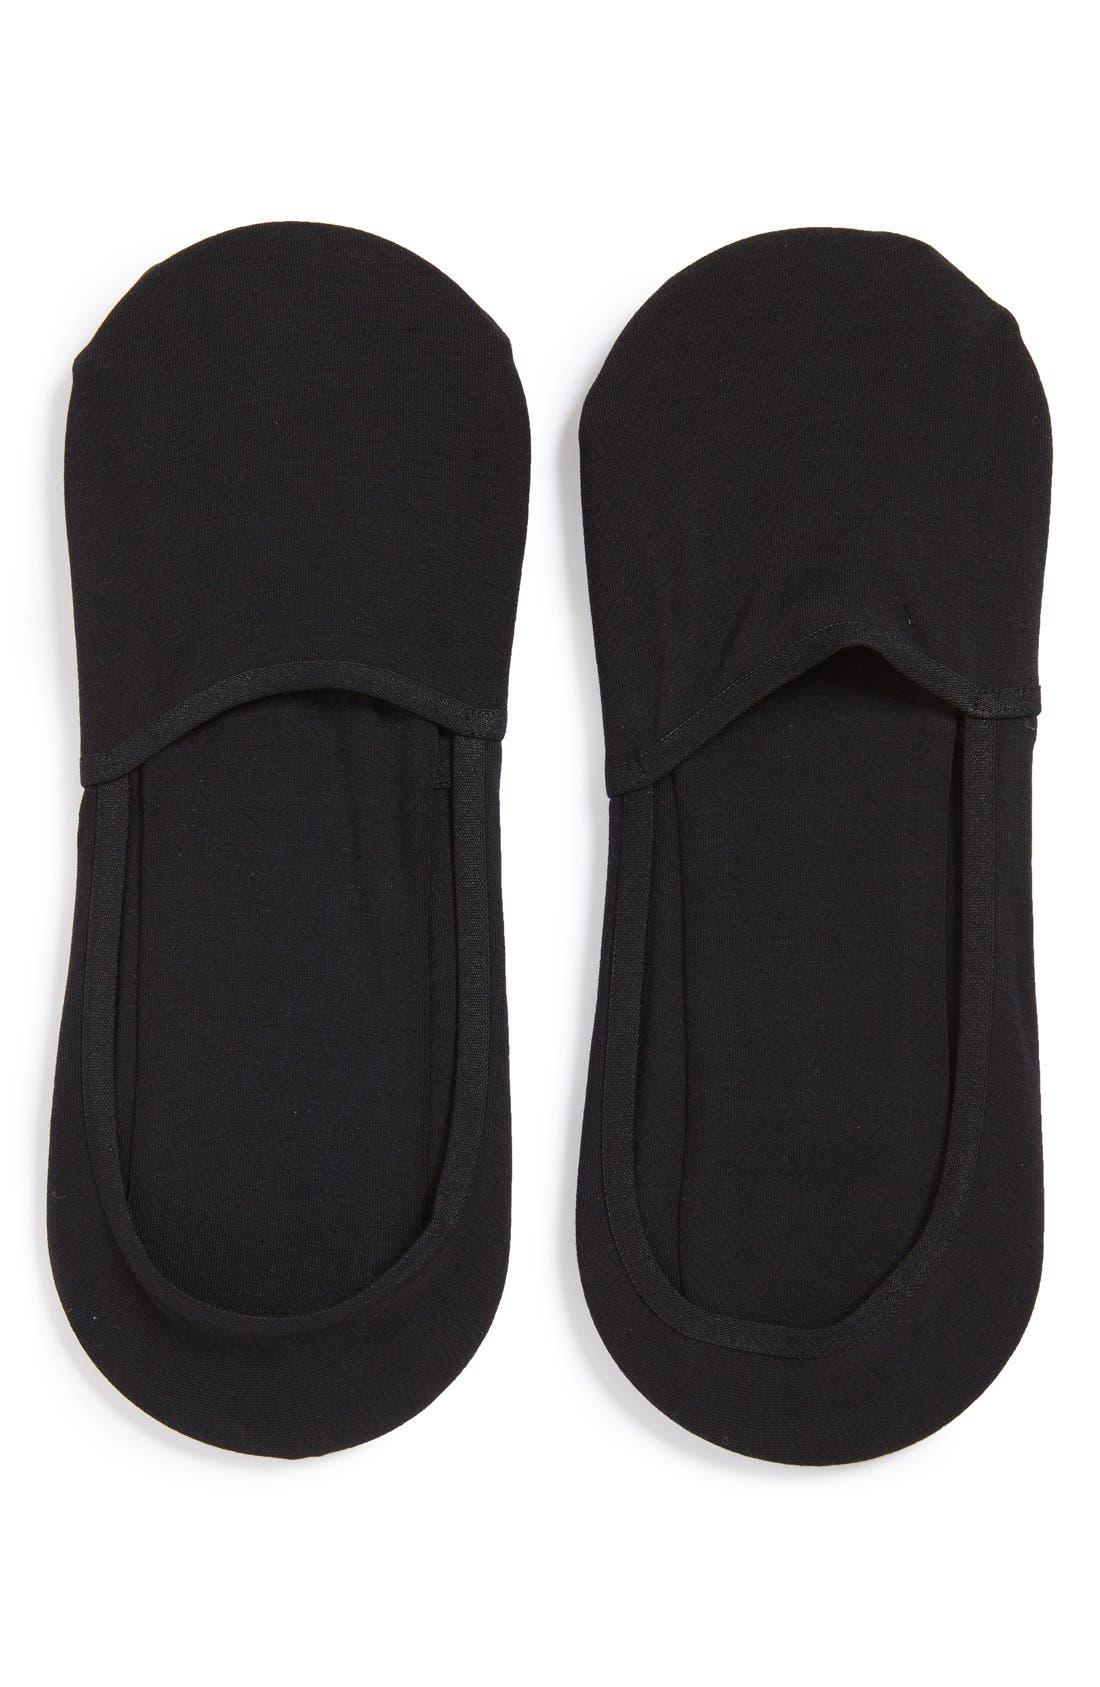 2-Pack No-Show Socks,                         Main,                         color, BLACK